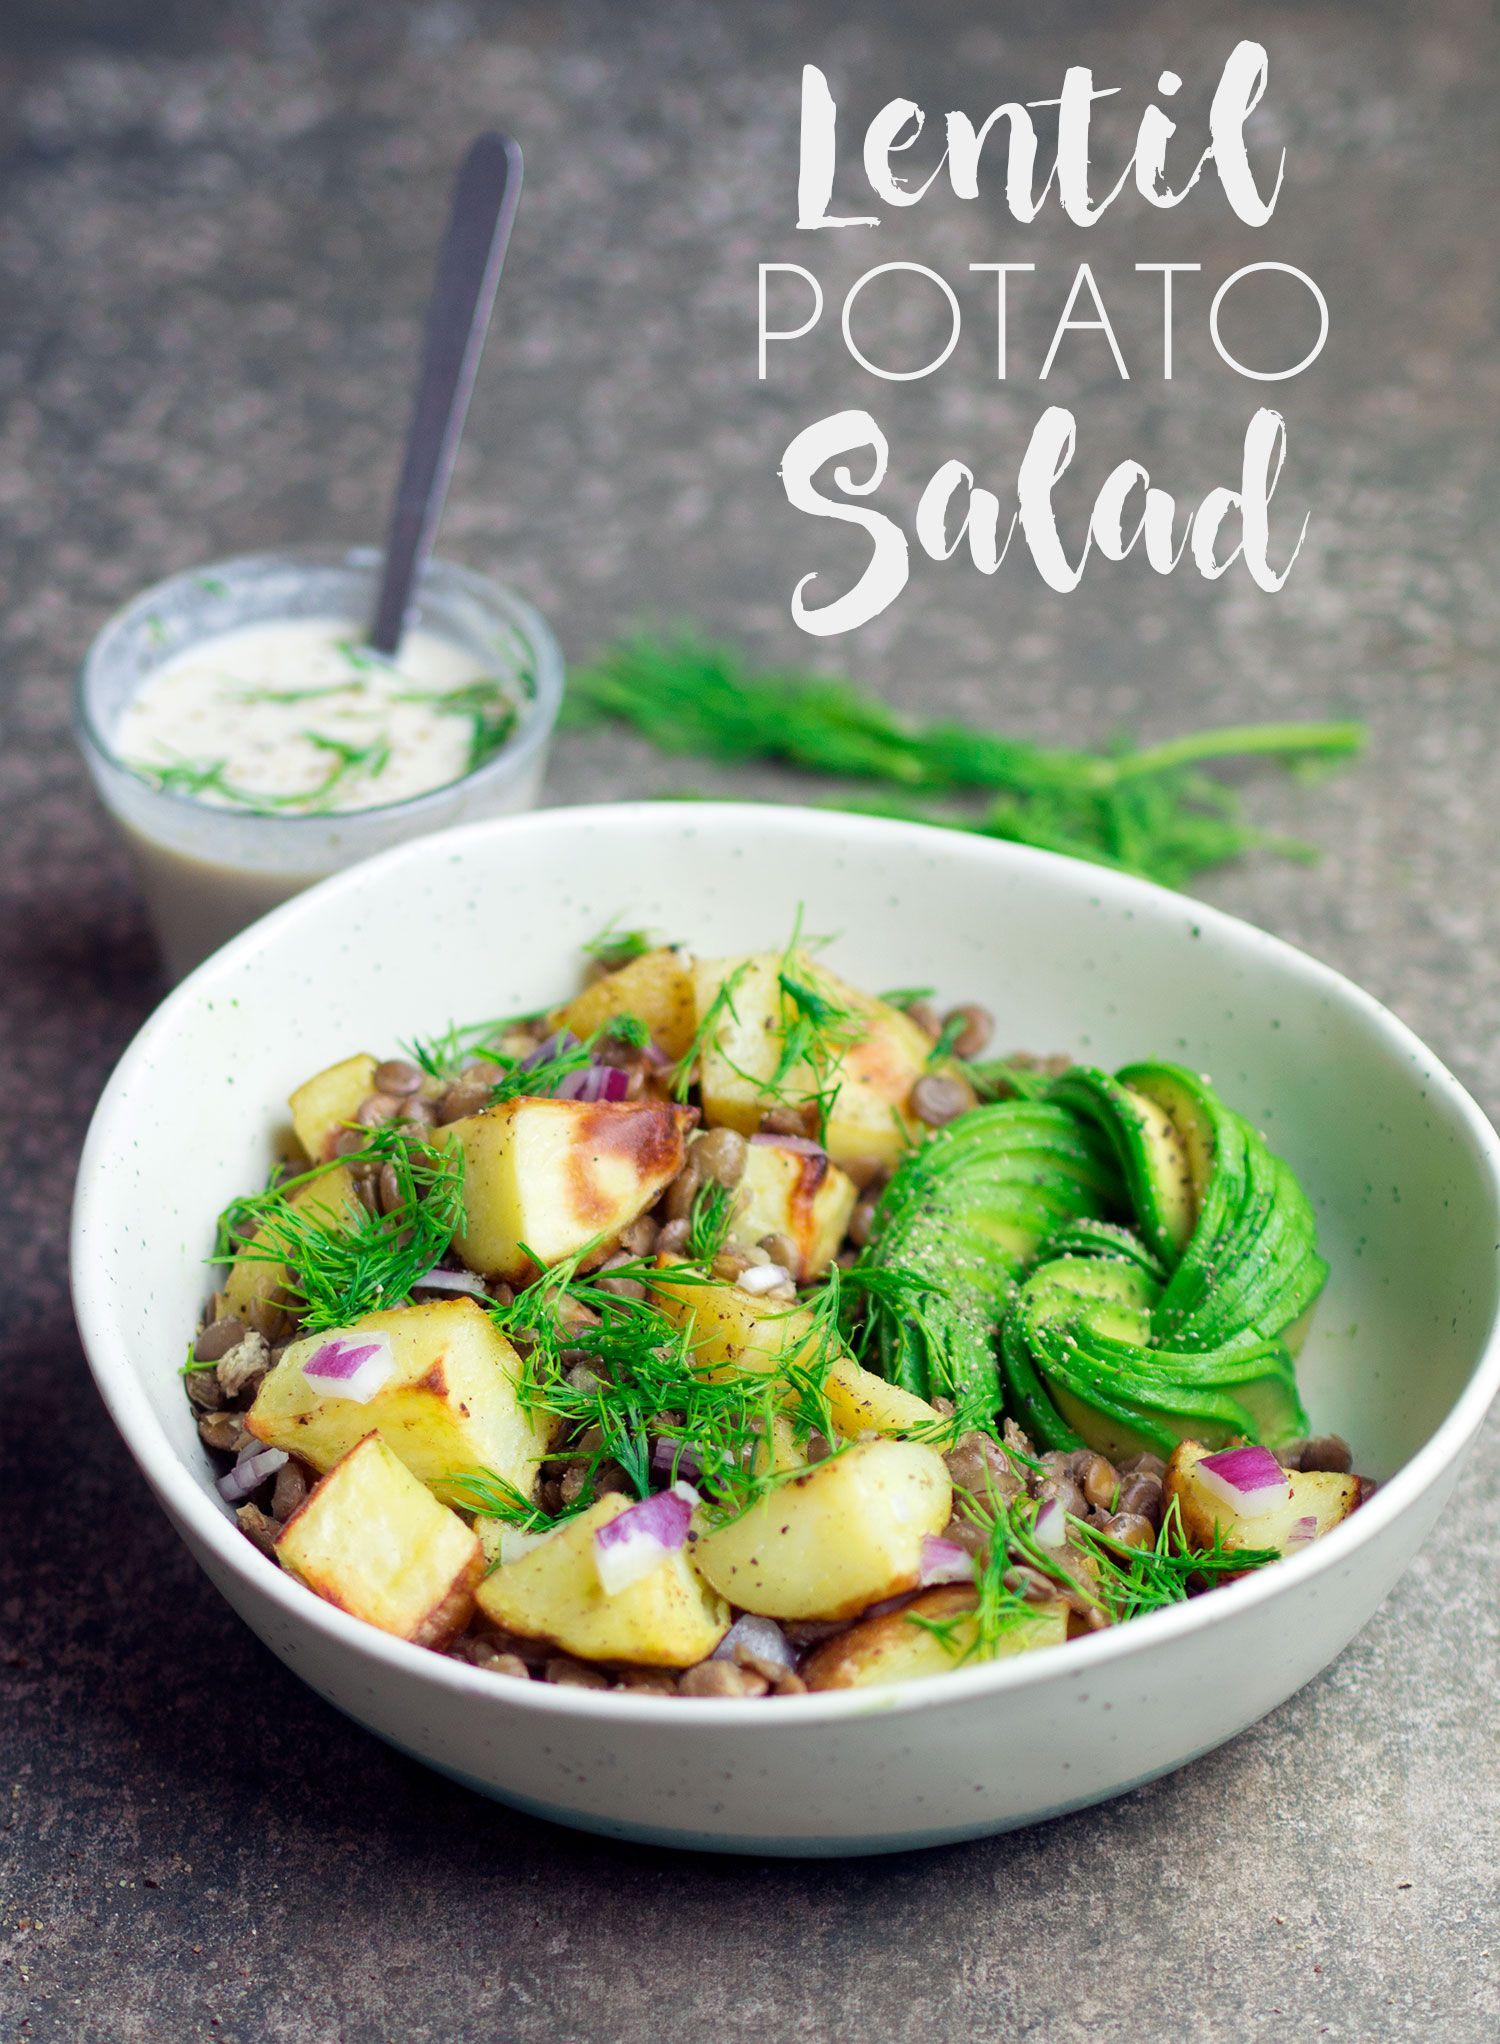 Green Lentil Potato Salad